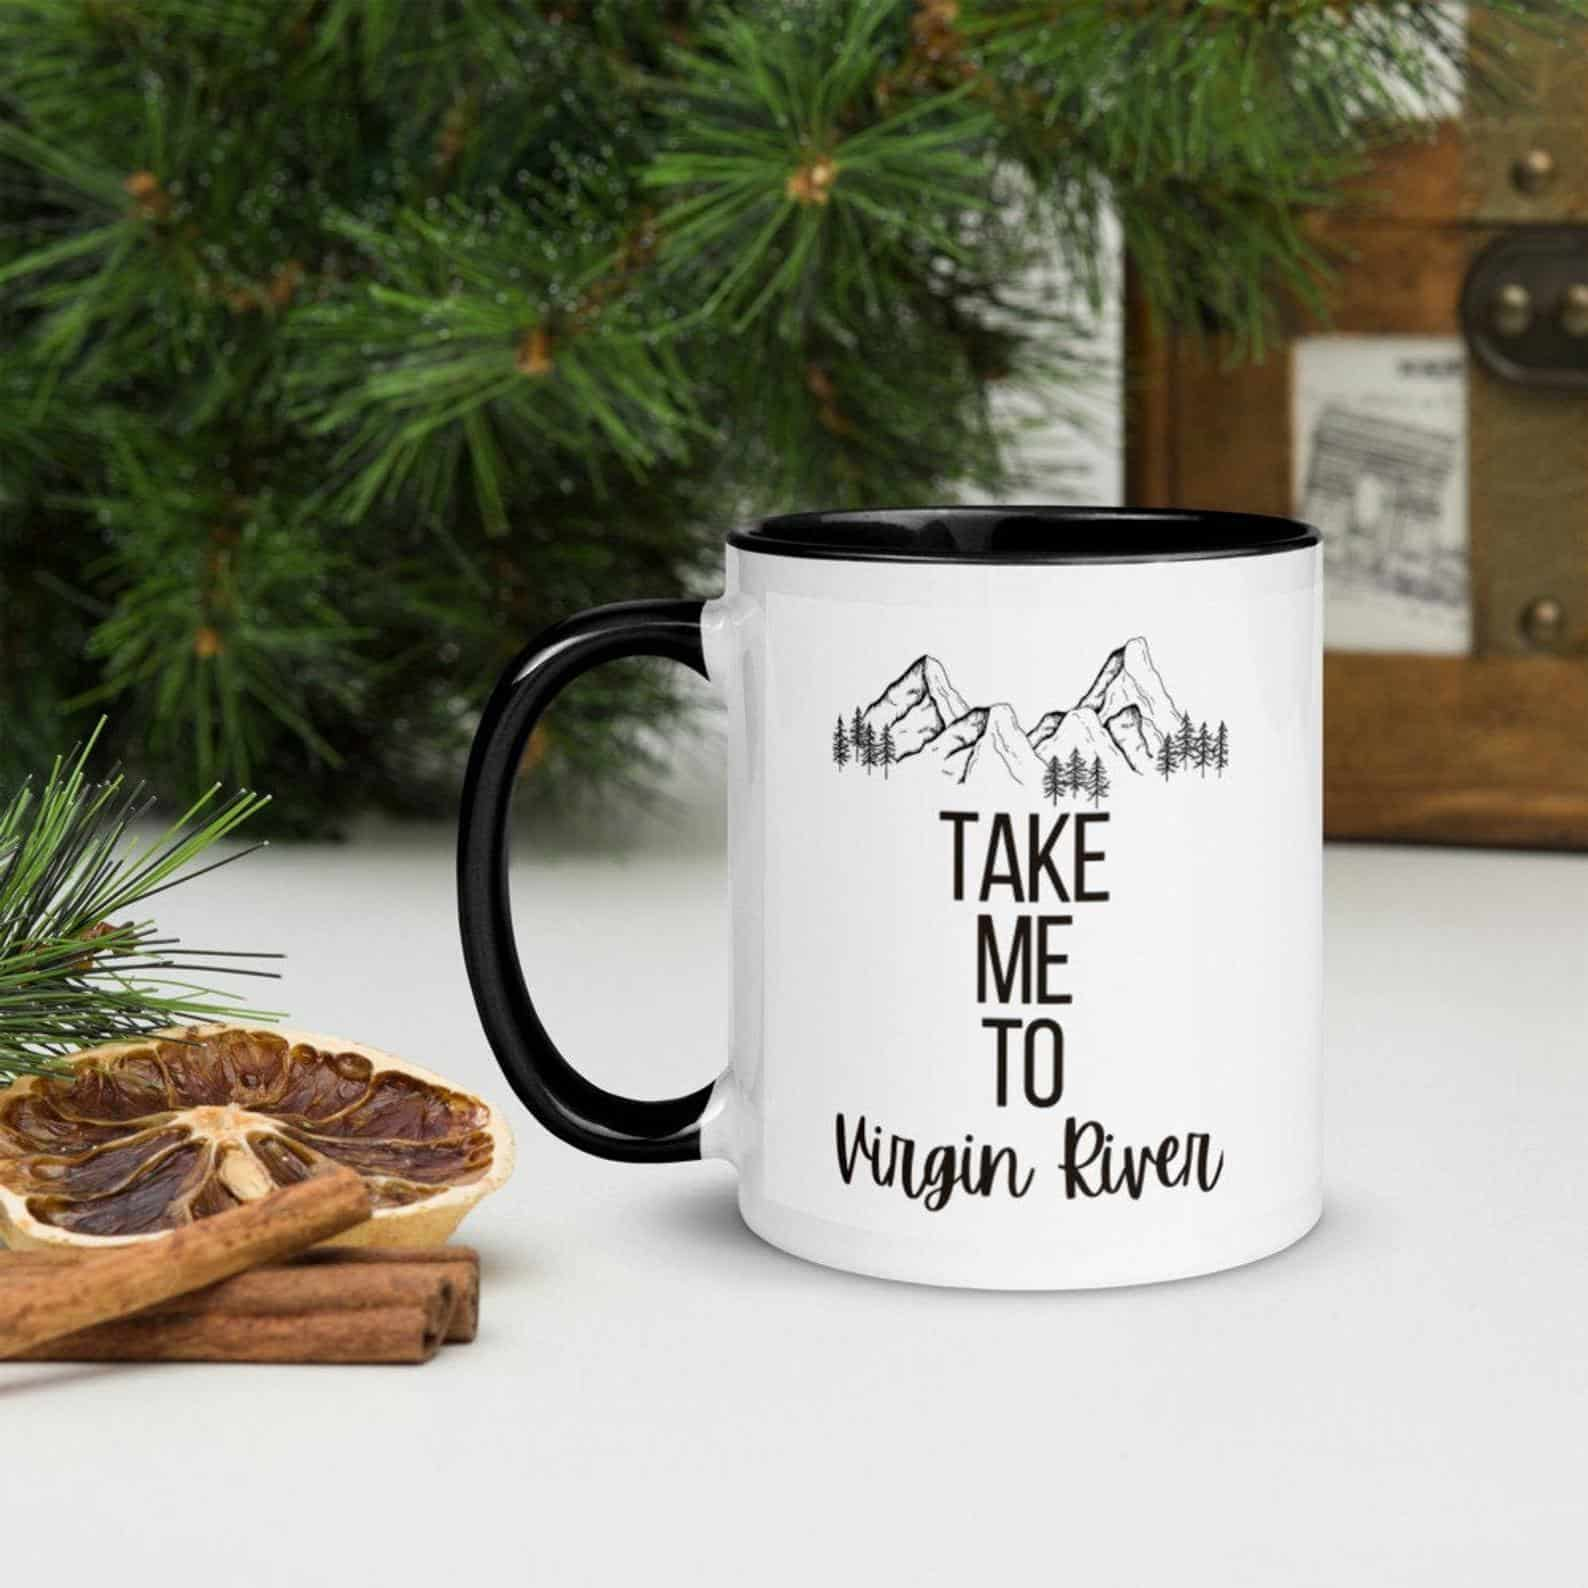 Take me to virgin river mug for fans